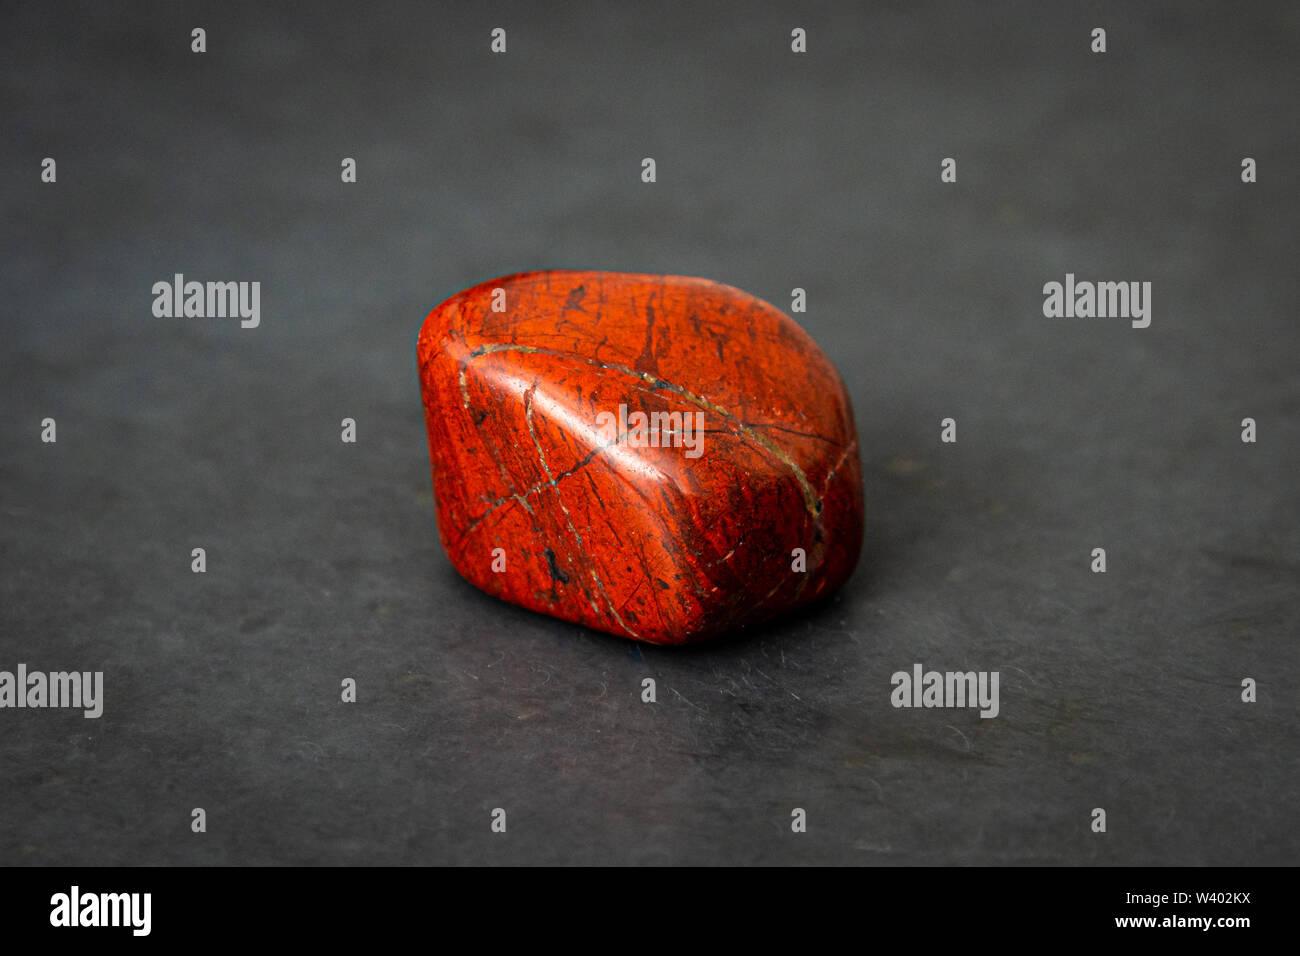 Breckzien jasper gem shining in powerful tones of deep red - Stock Image